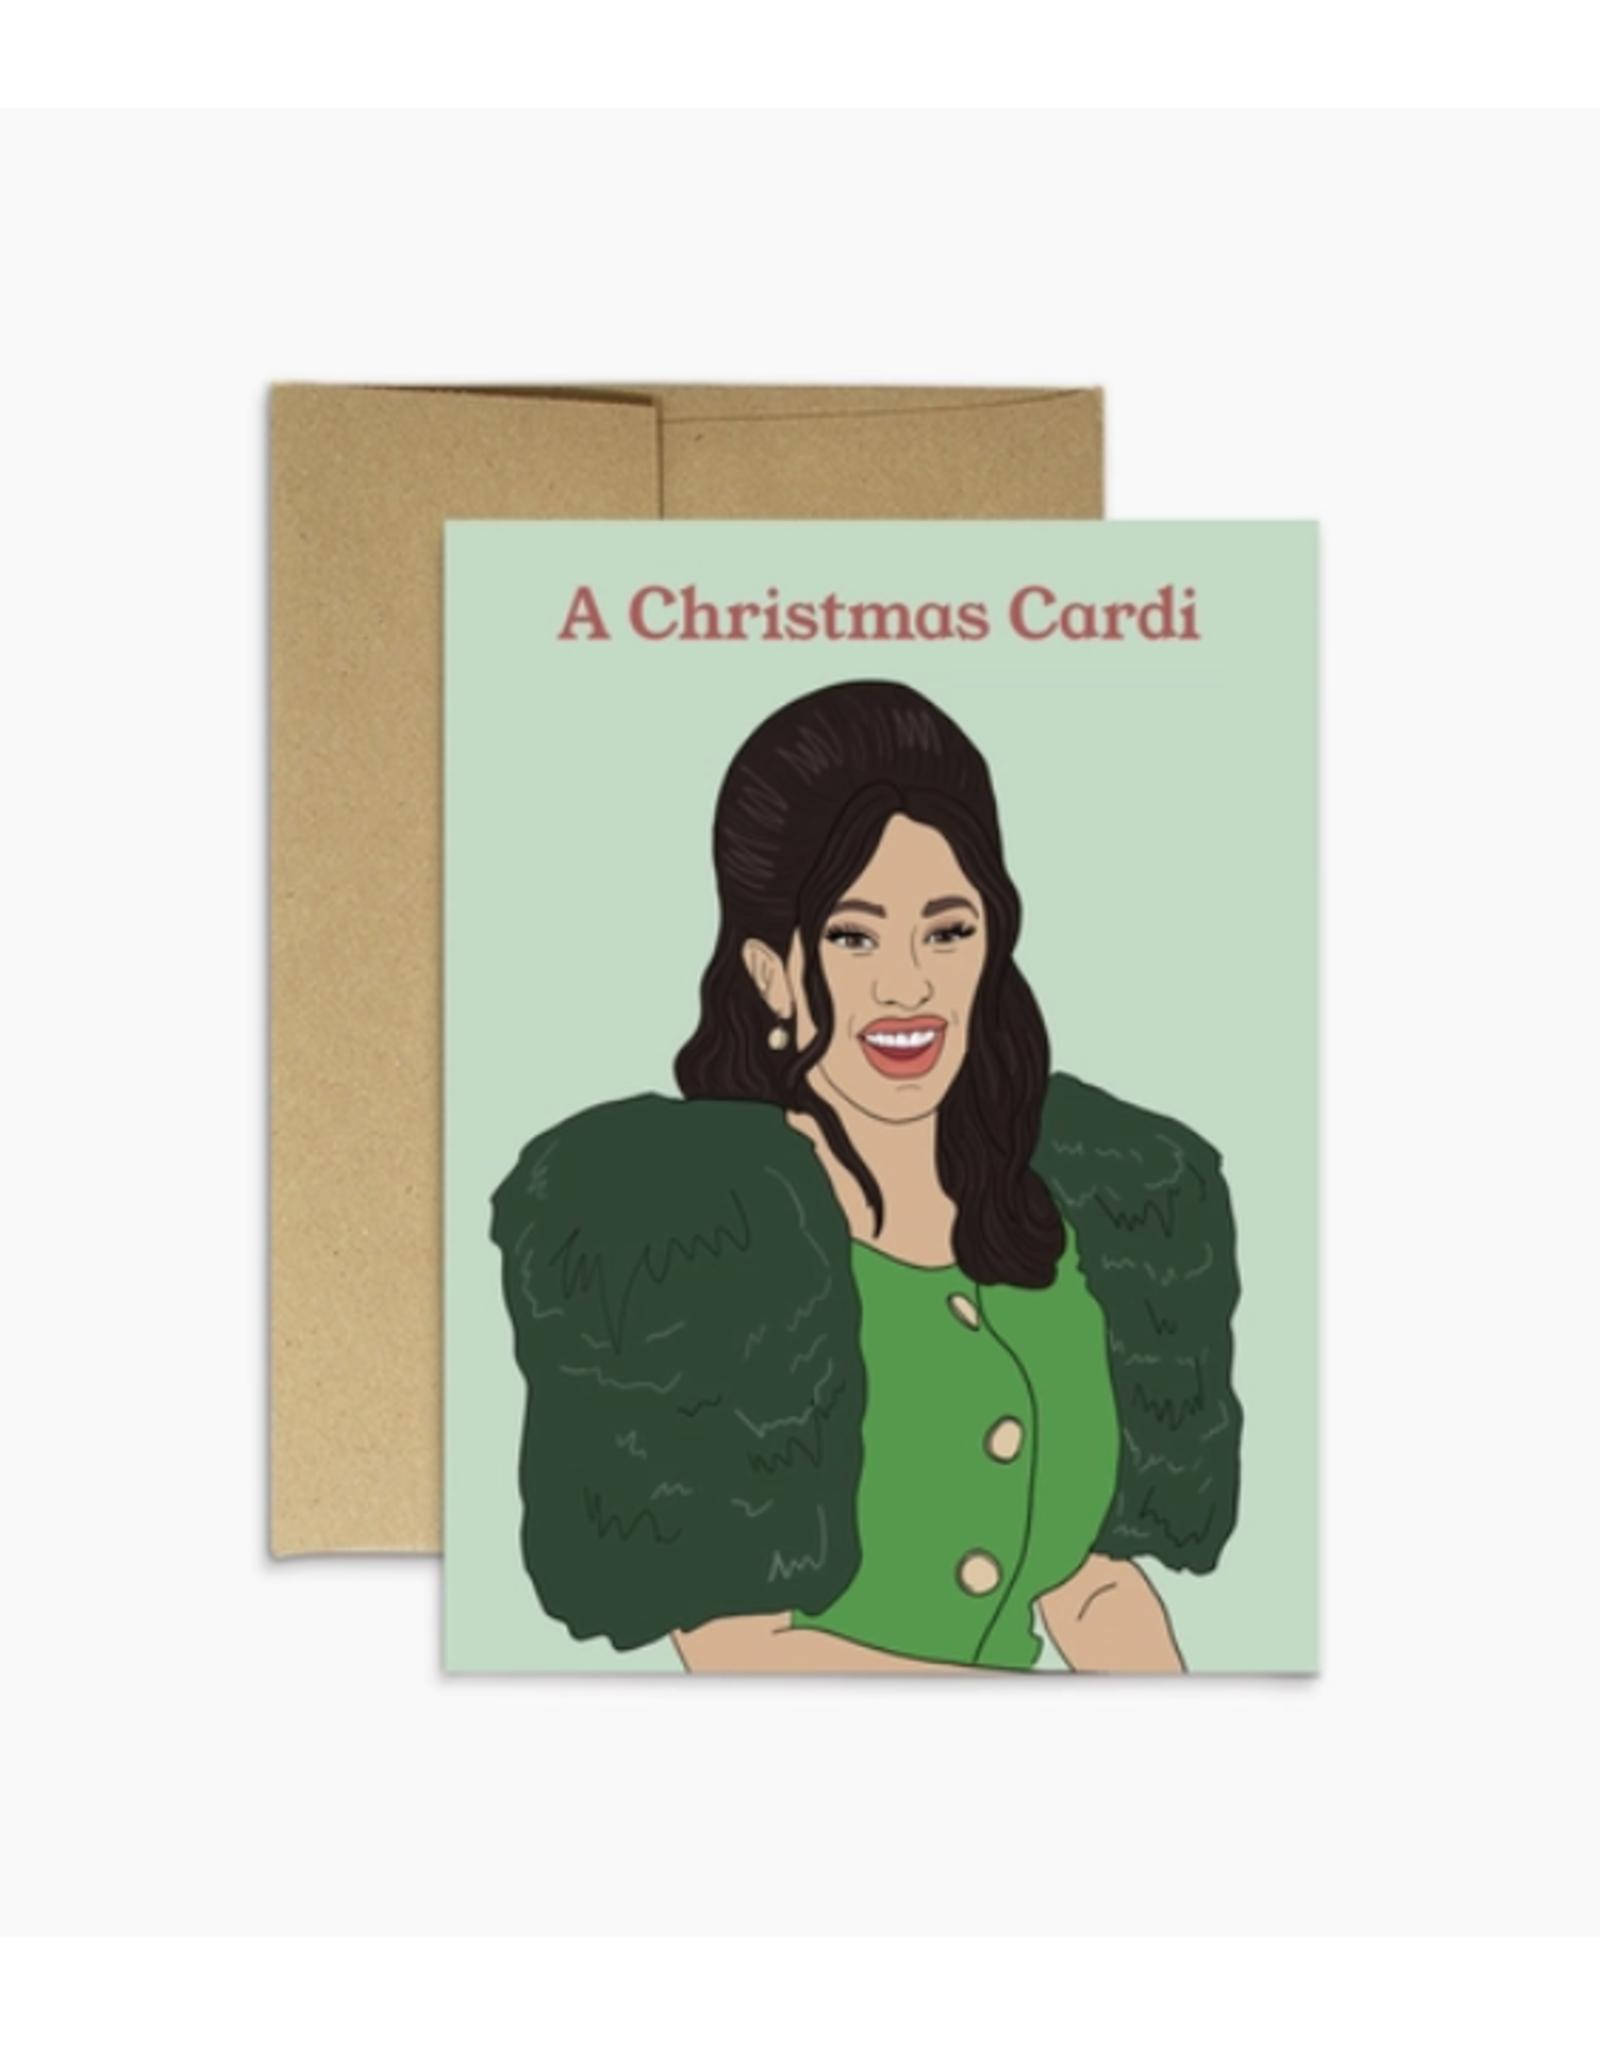 A Christmas Cardi (B) Greeting Card